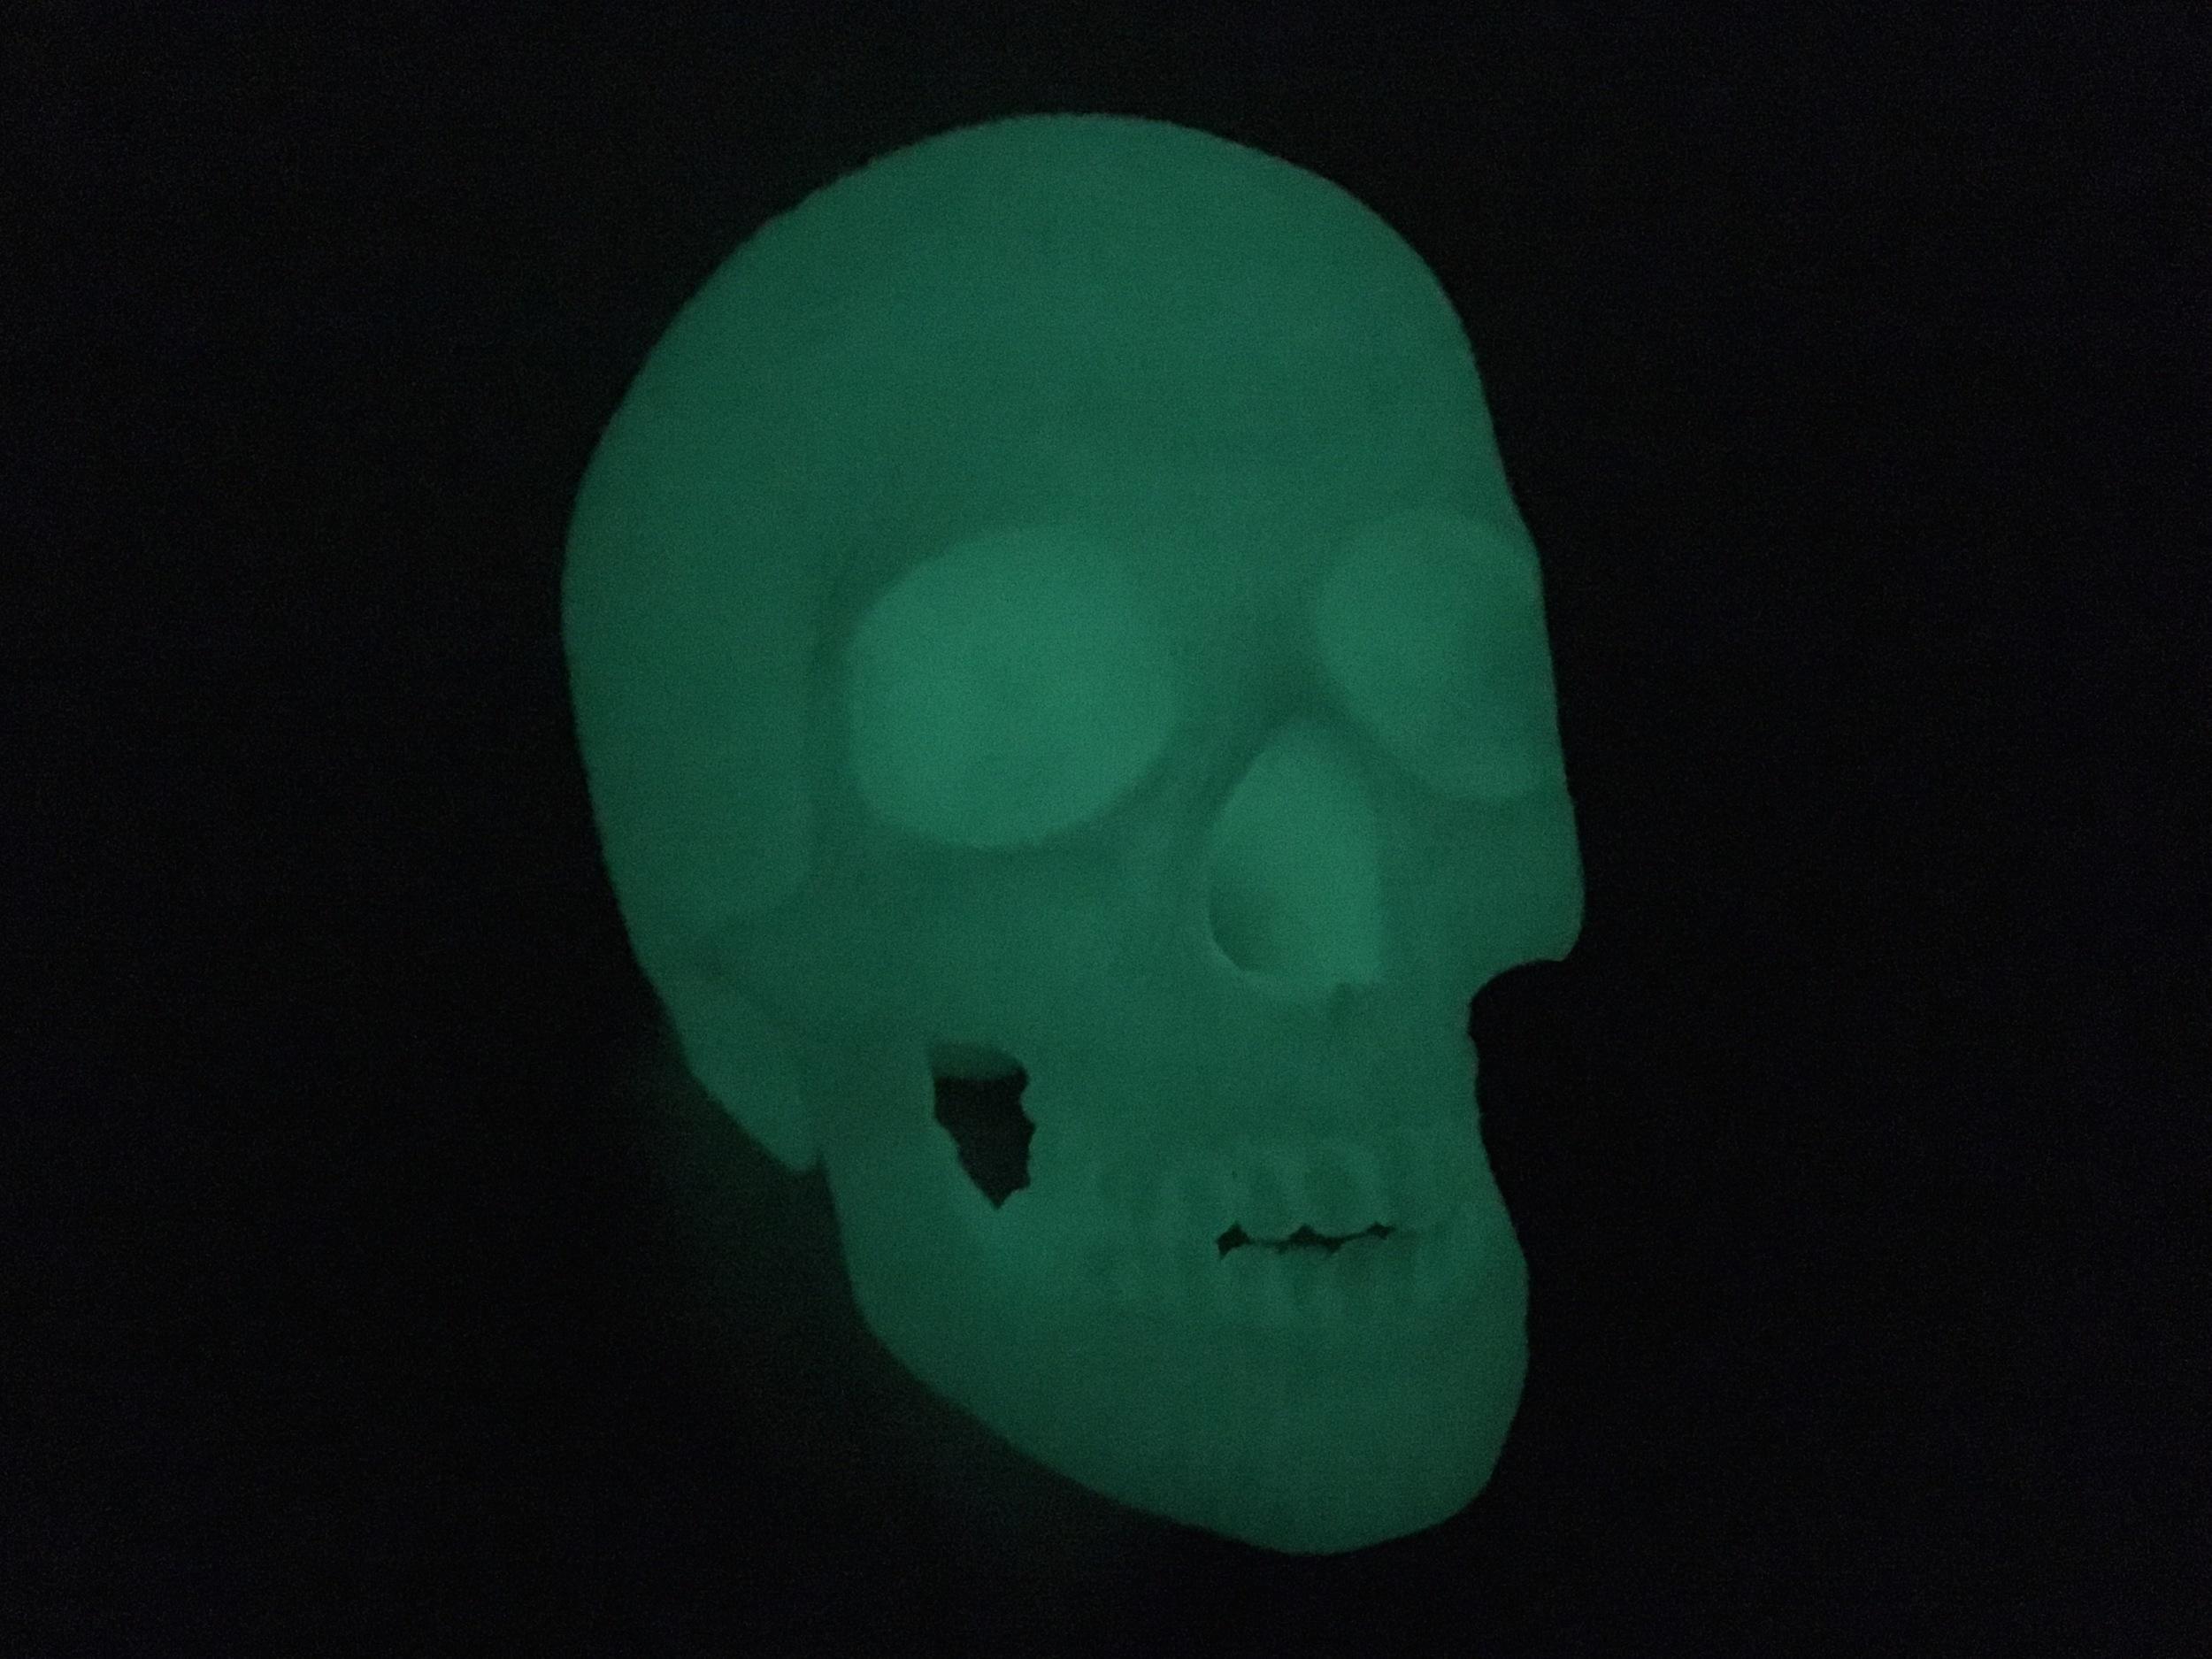 Life size 3D print of a human skull using glow-in-the-dark PLA filament